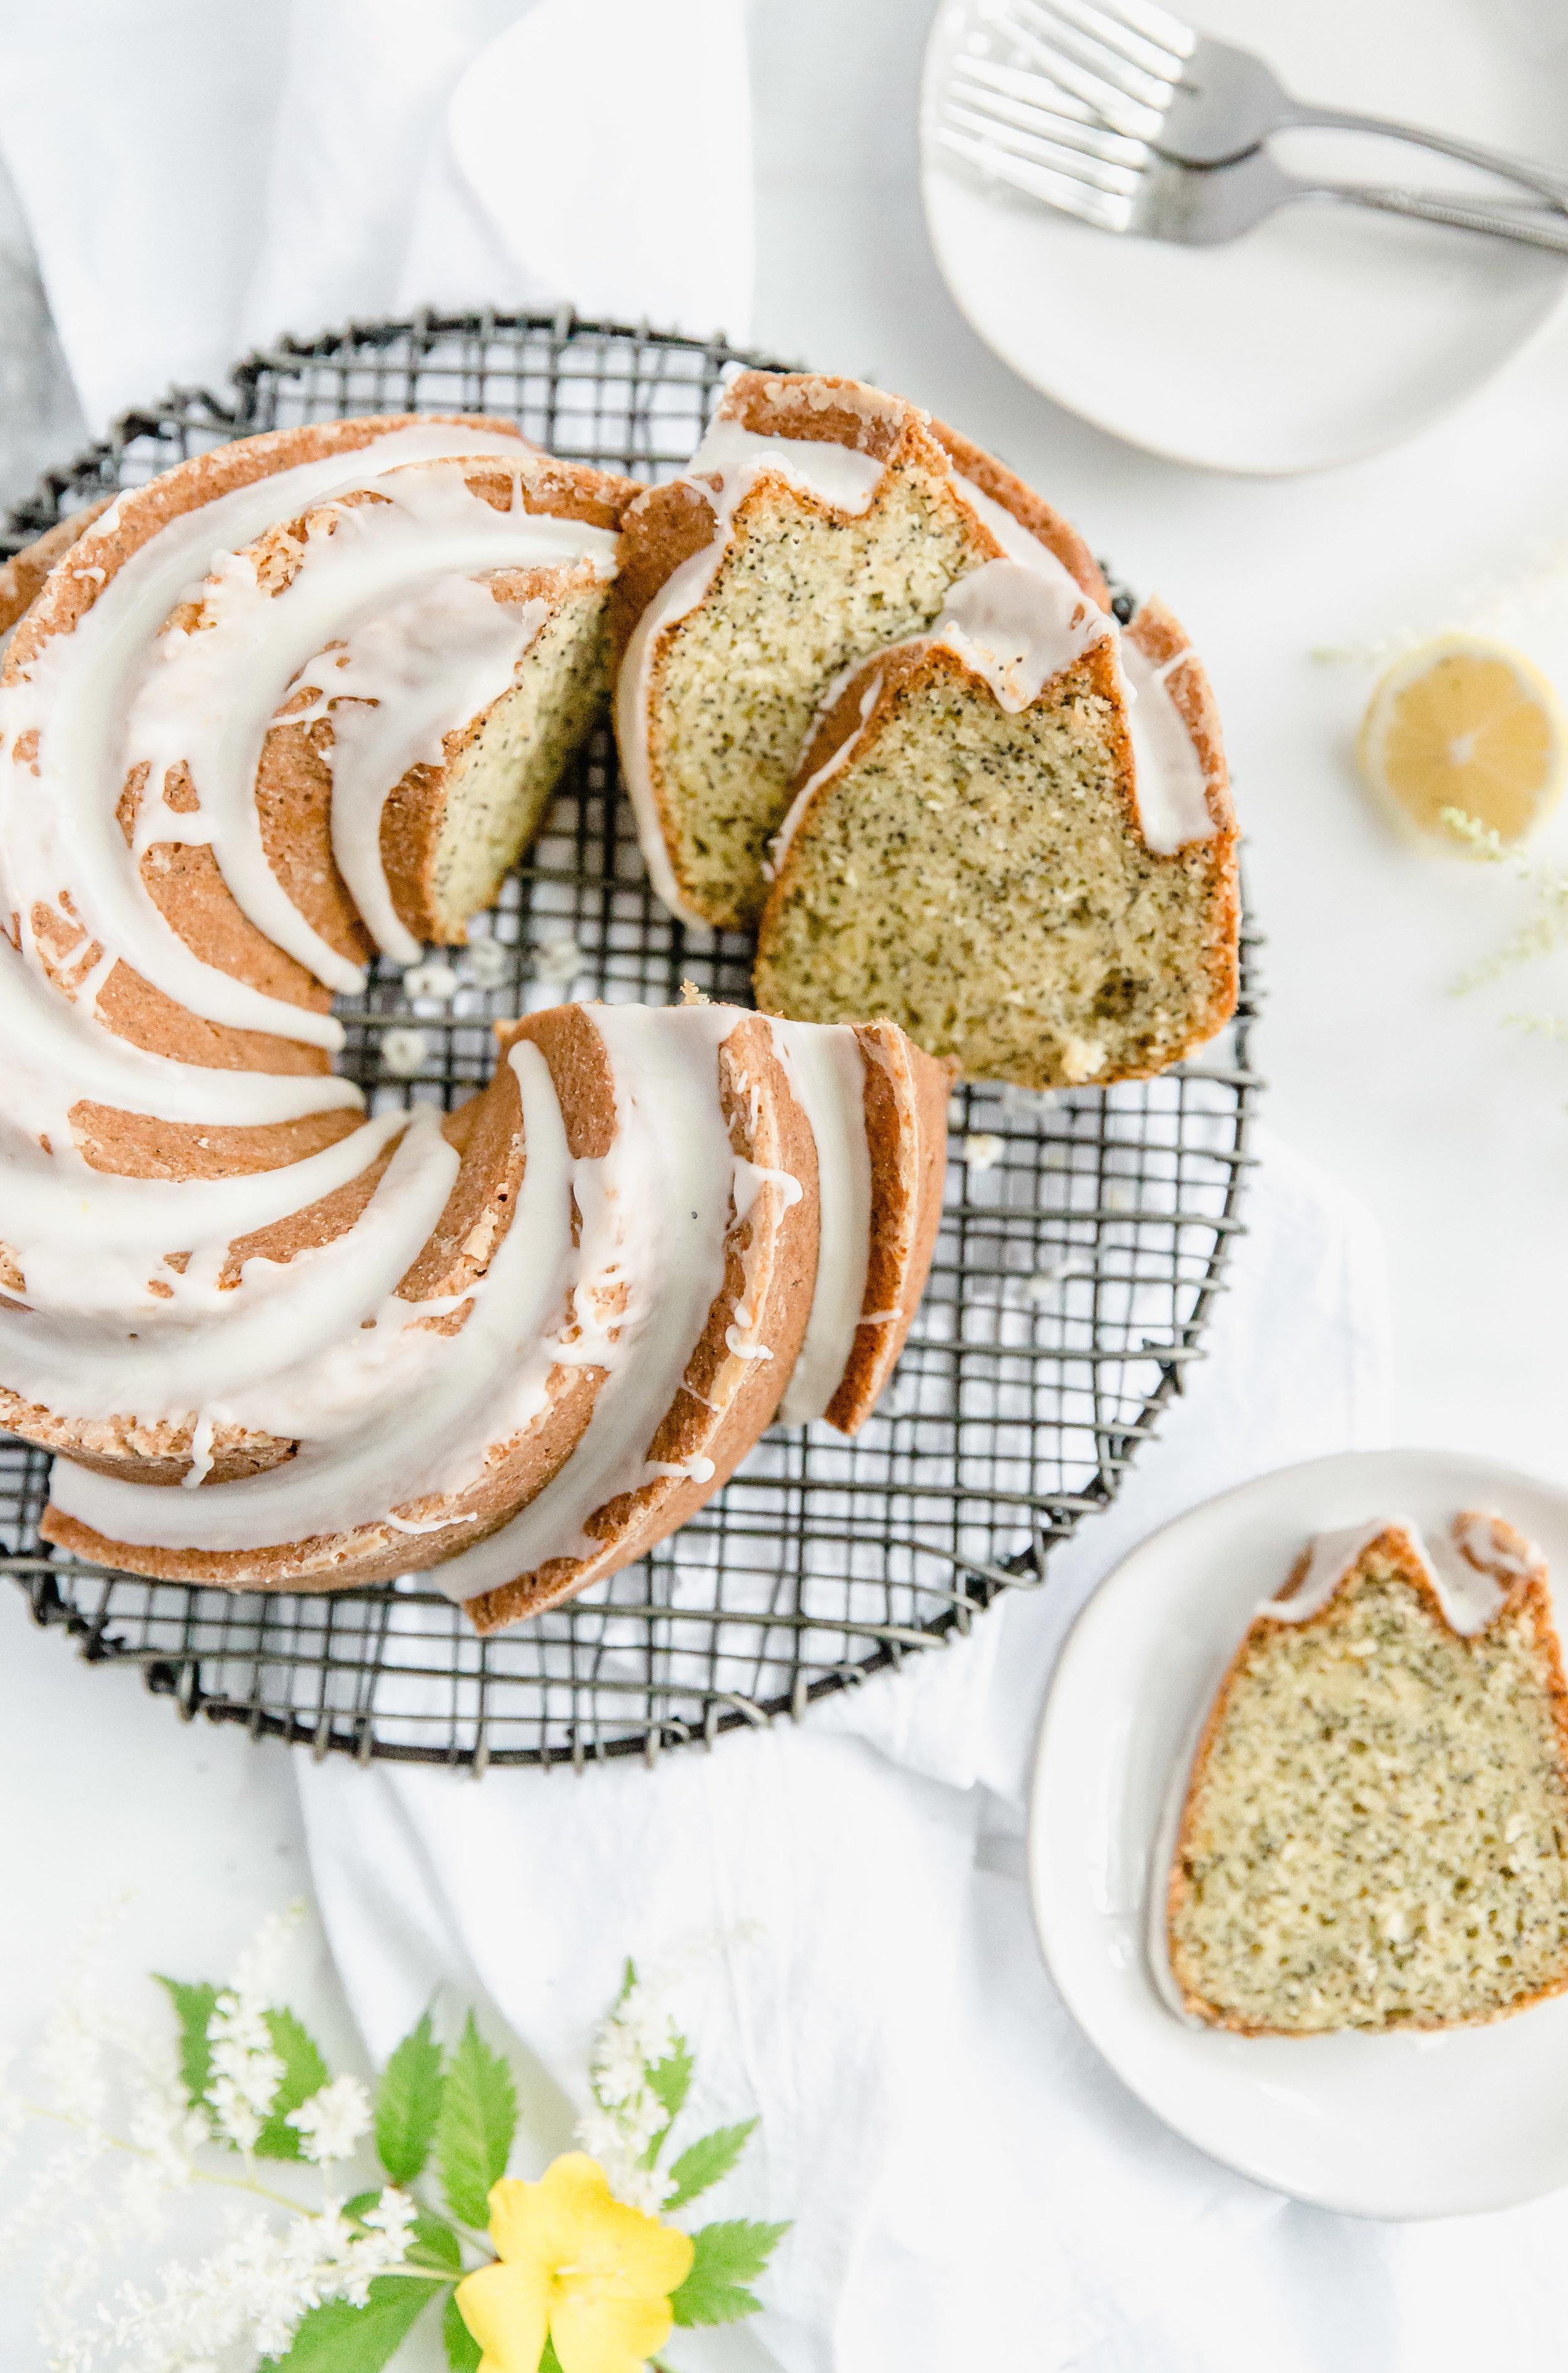 lemon-poppy-seed-bundt-cake-with-lemon-glaze-9.jpg